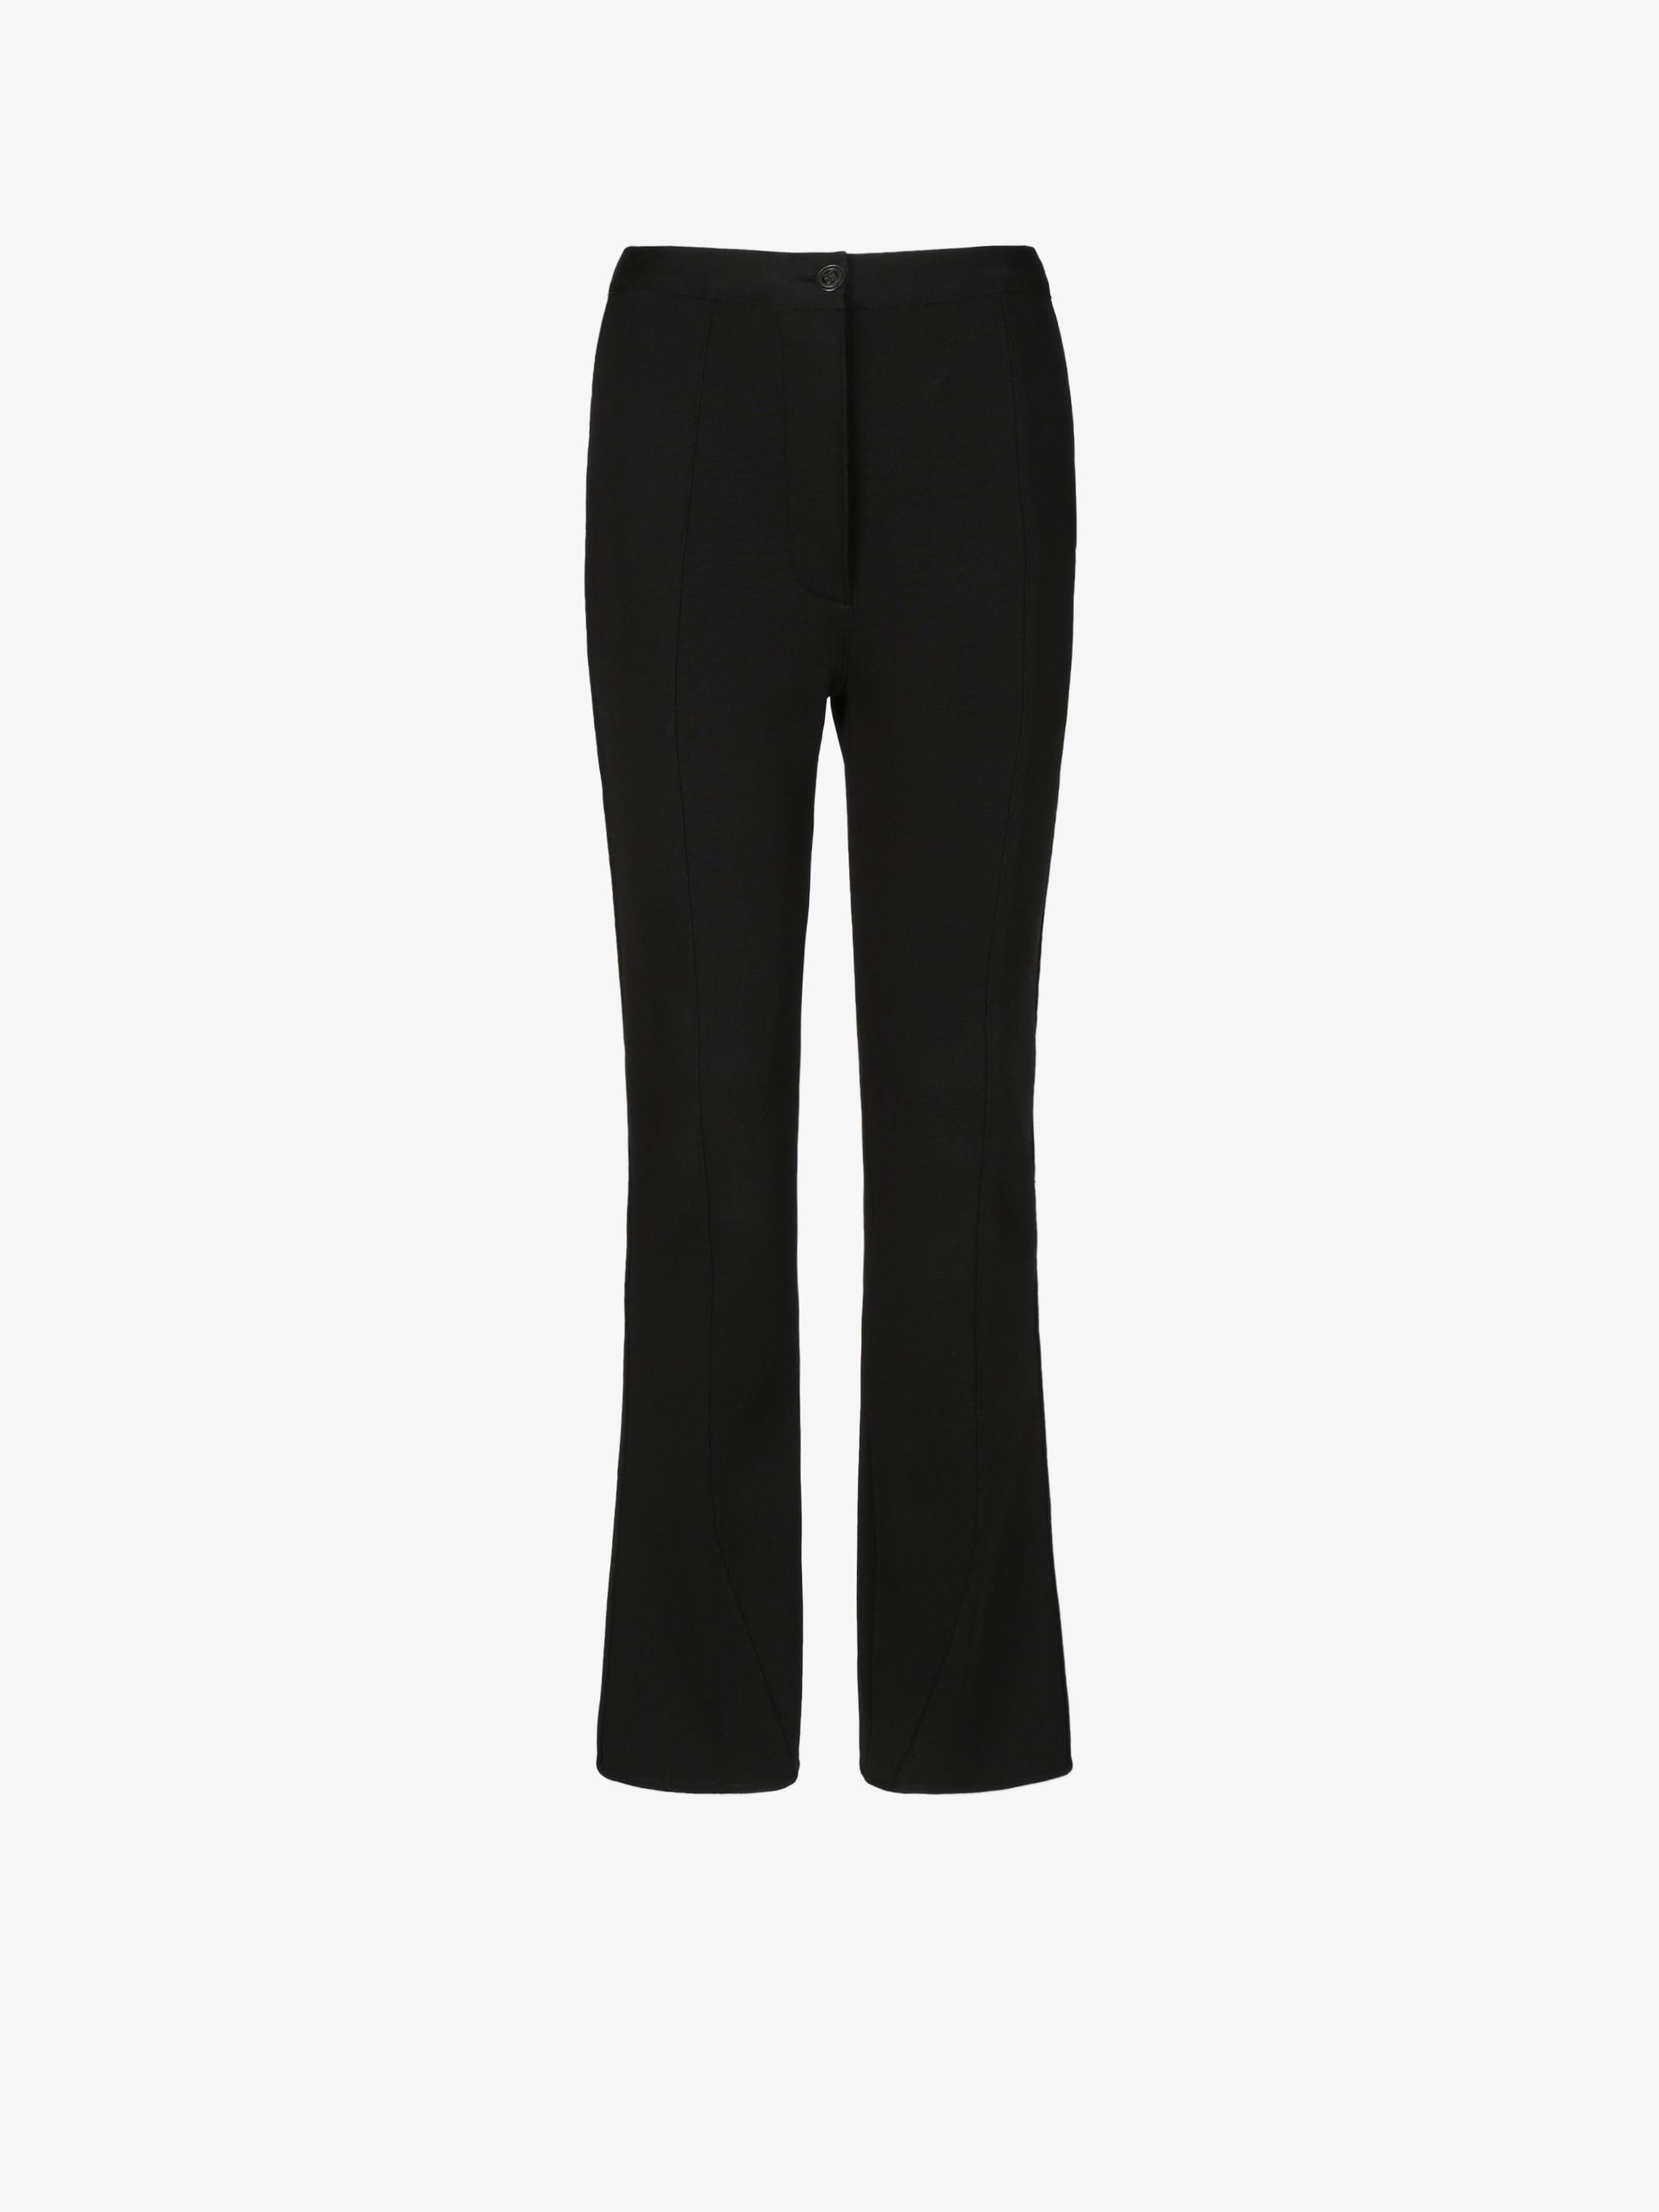 Slim flared trousers